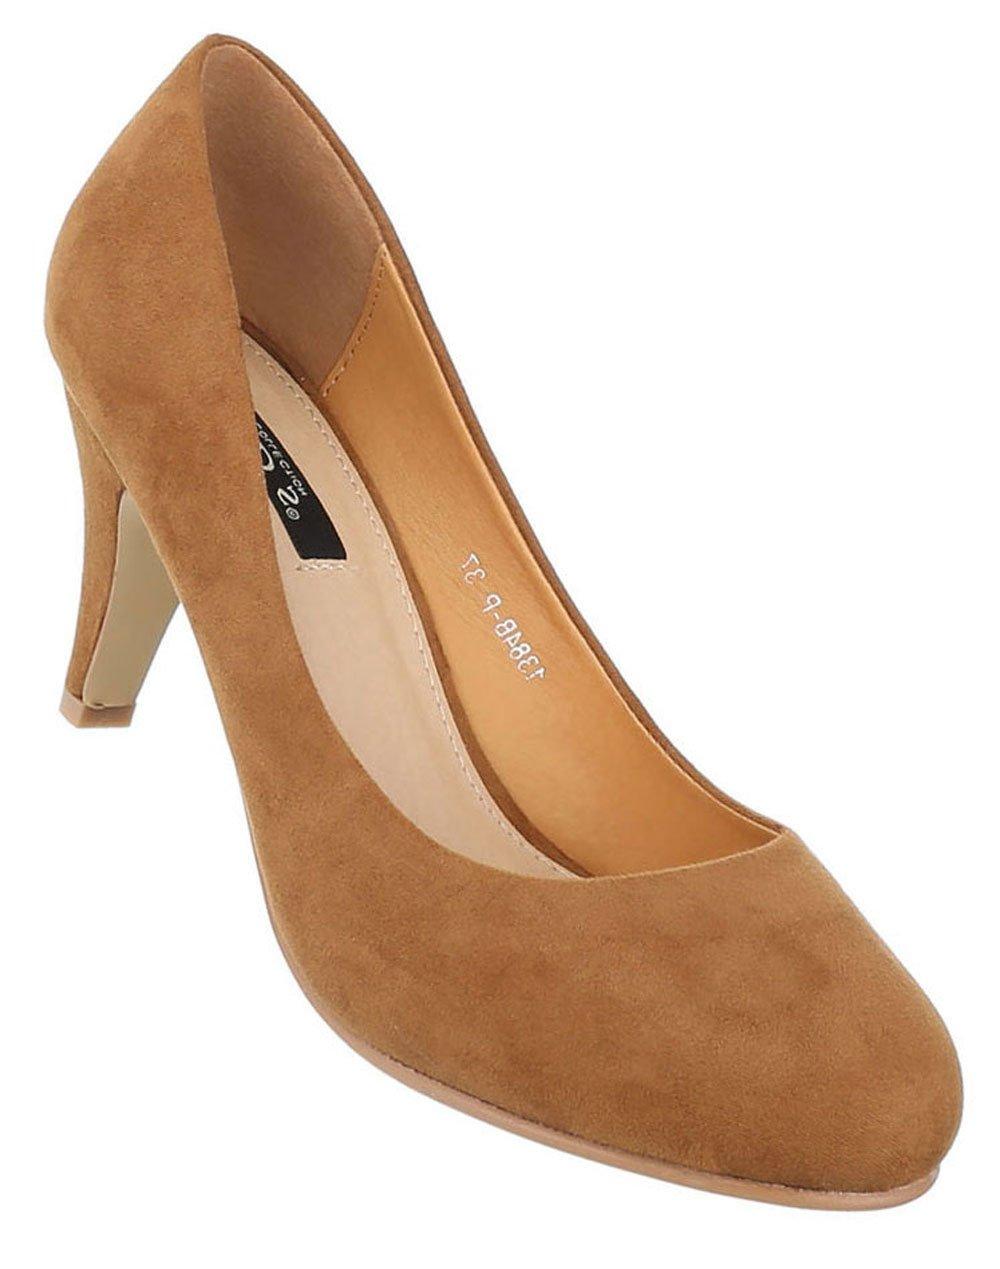 Schuhcity24 Klassische Pumps | Damen High Heels | Runde Stilettos Leder-Optik | Buuml;roschuhe Schuhe Leder-Optik | Abendschuhe Kleiner Absatz36 EU|Camel